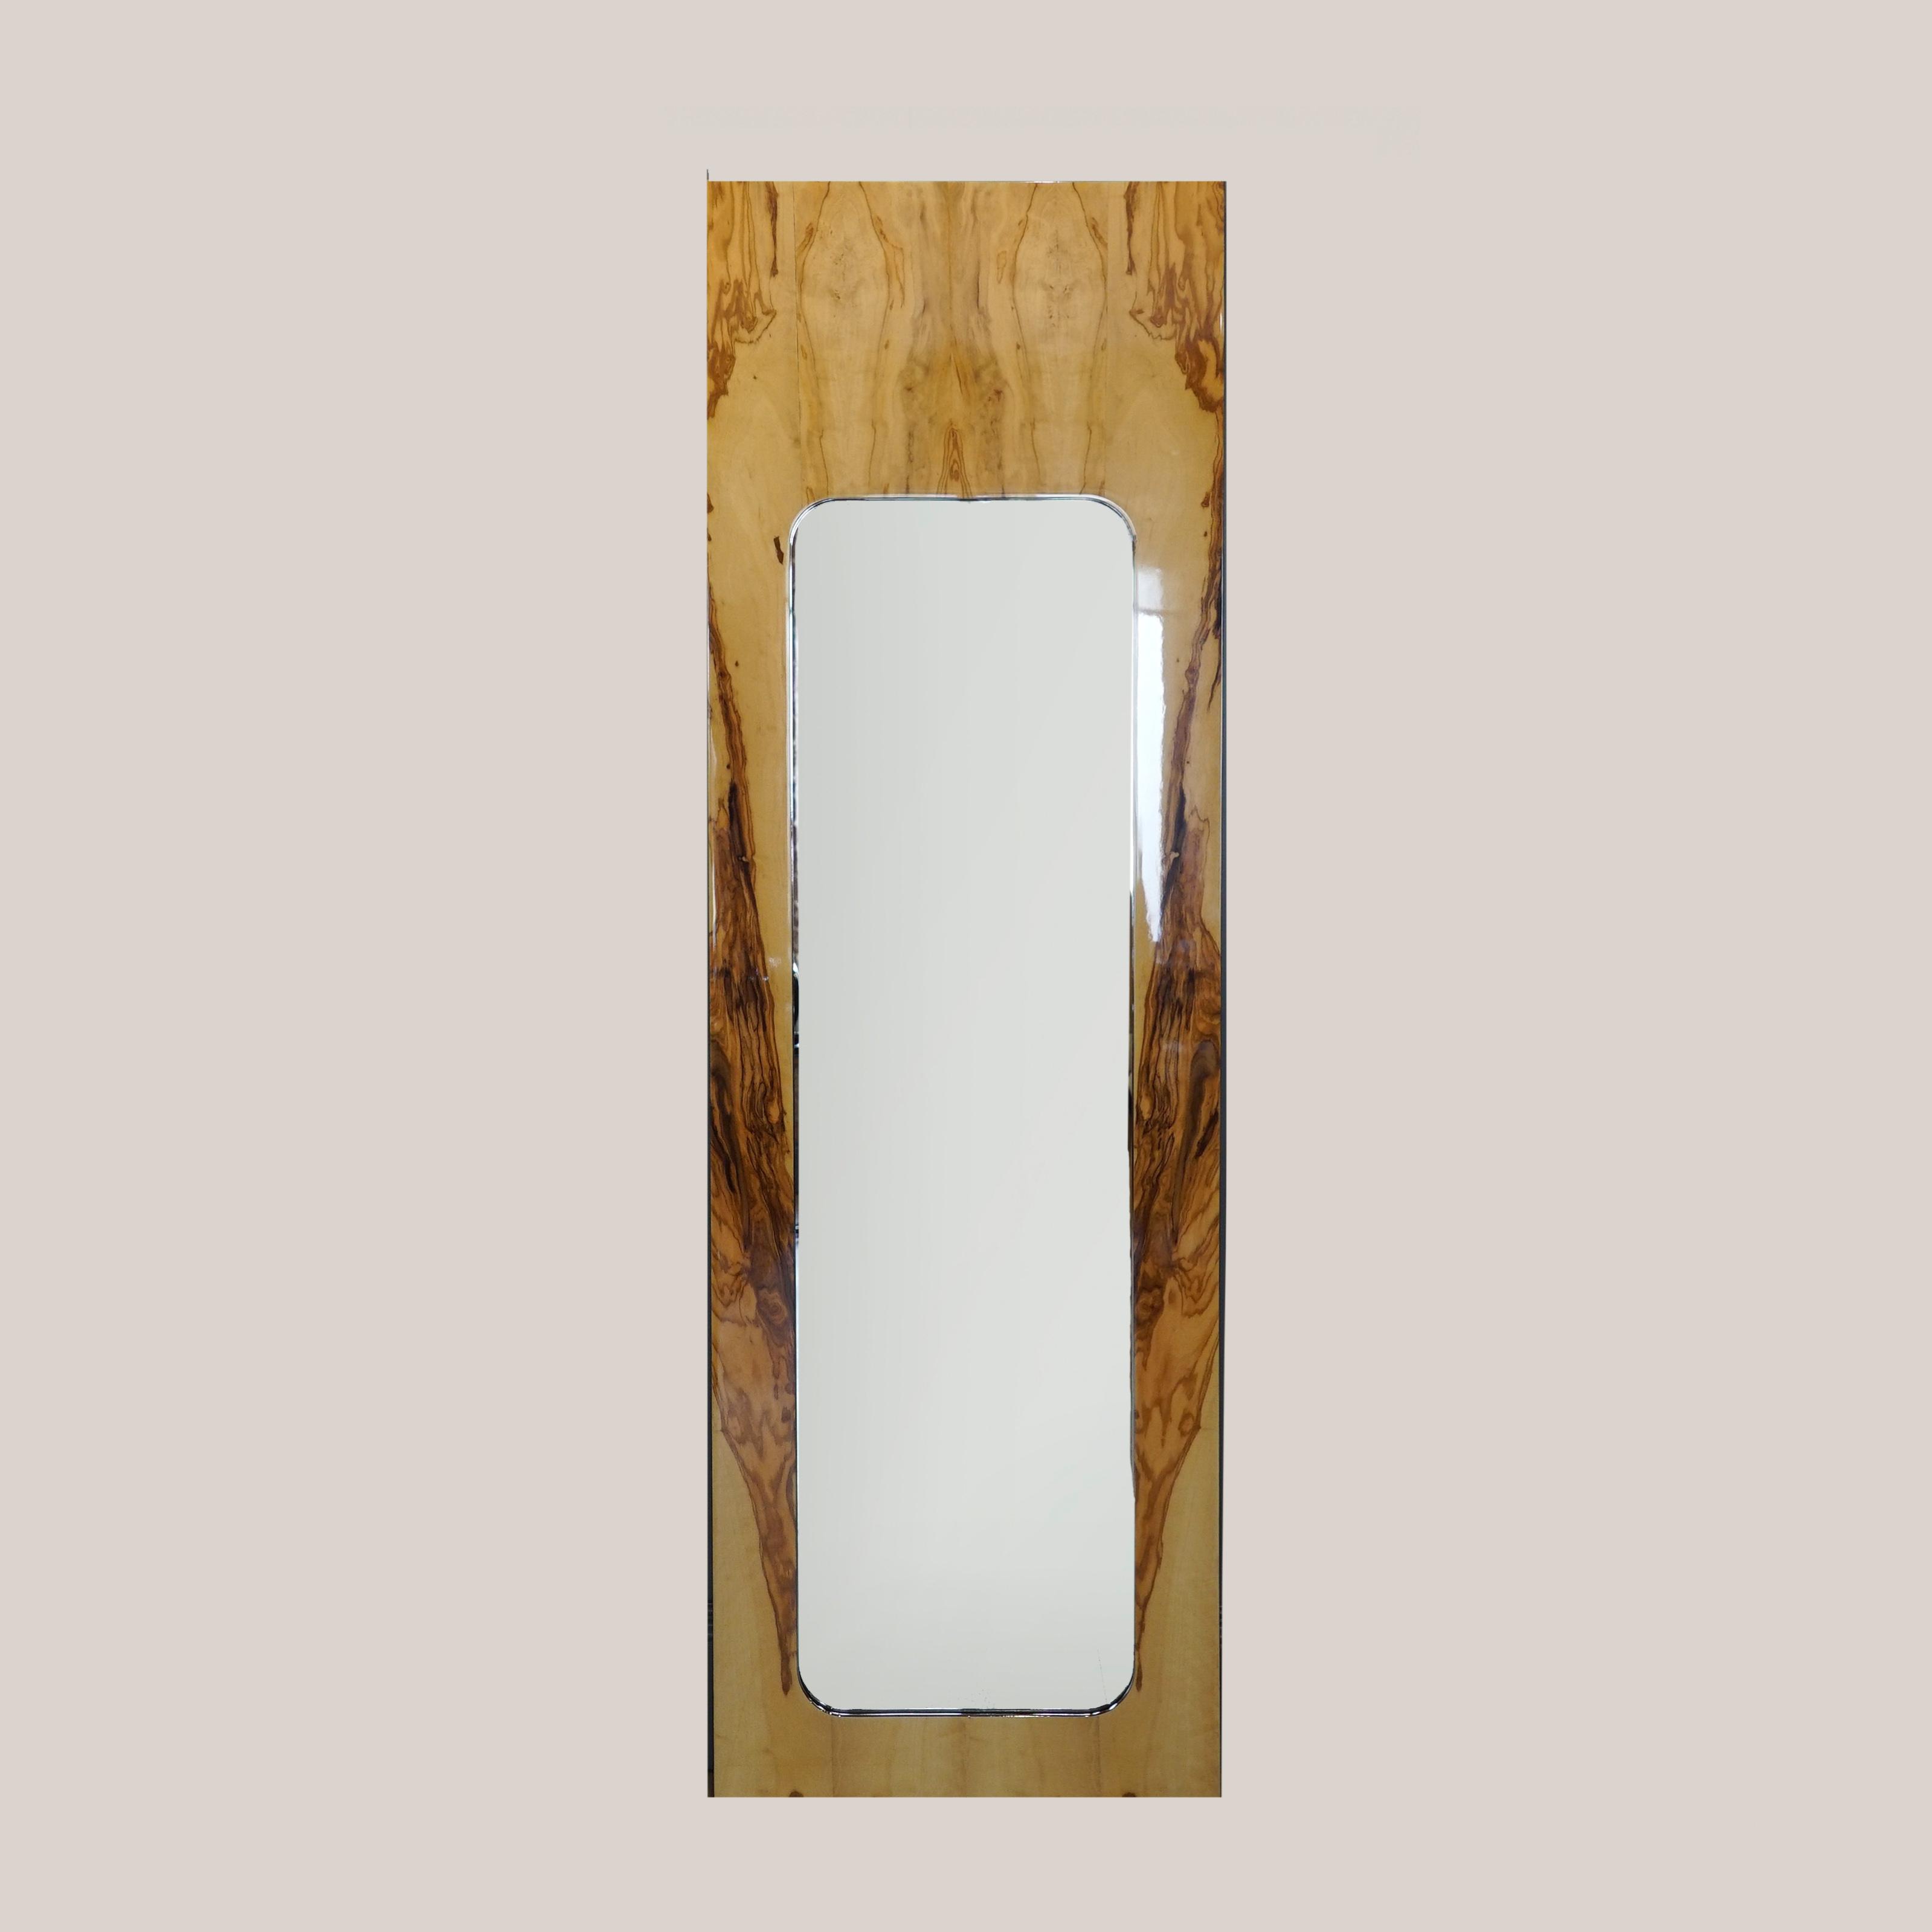 Зеркало олива среднее